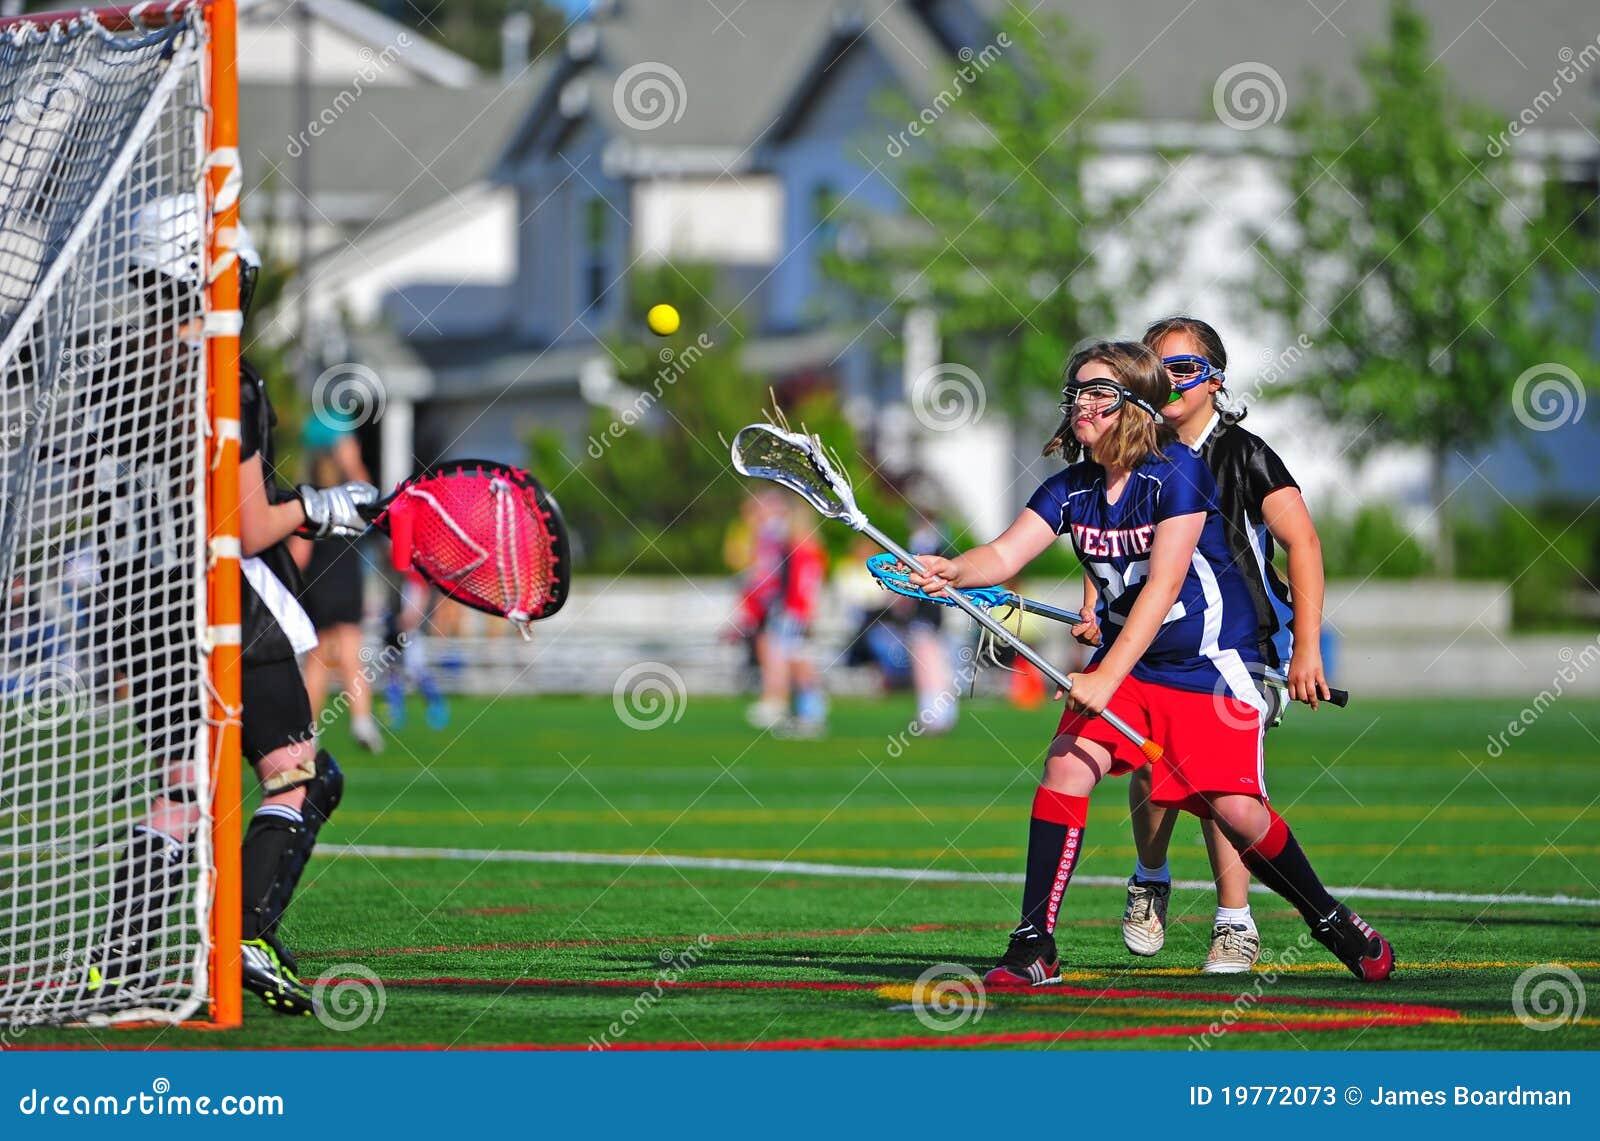 Lacrosse Youth girls goalie